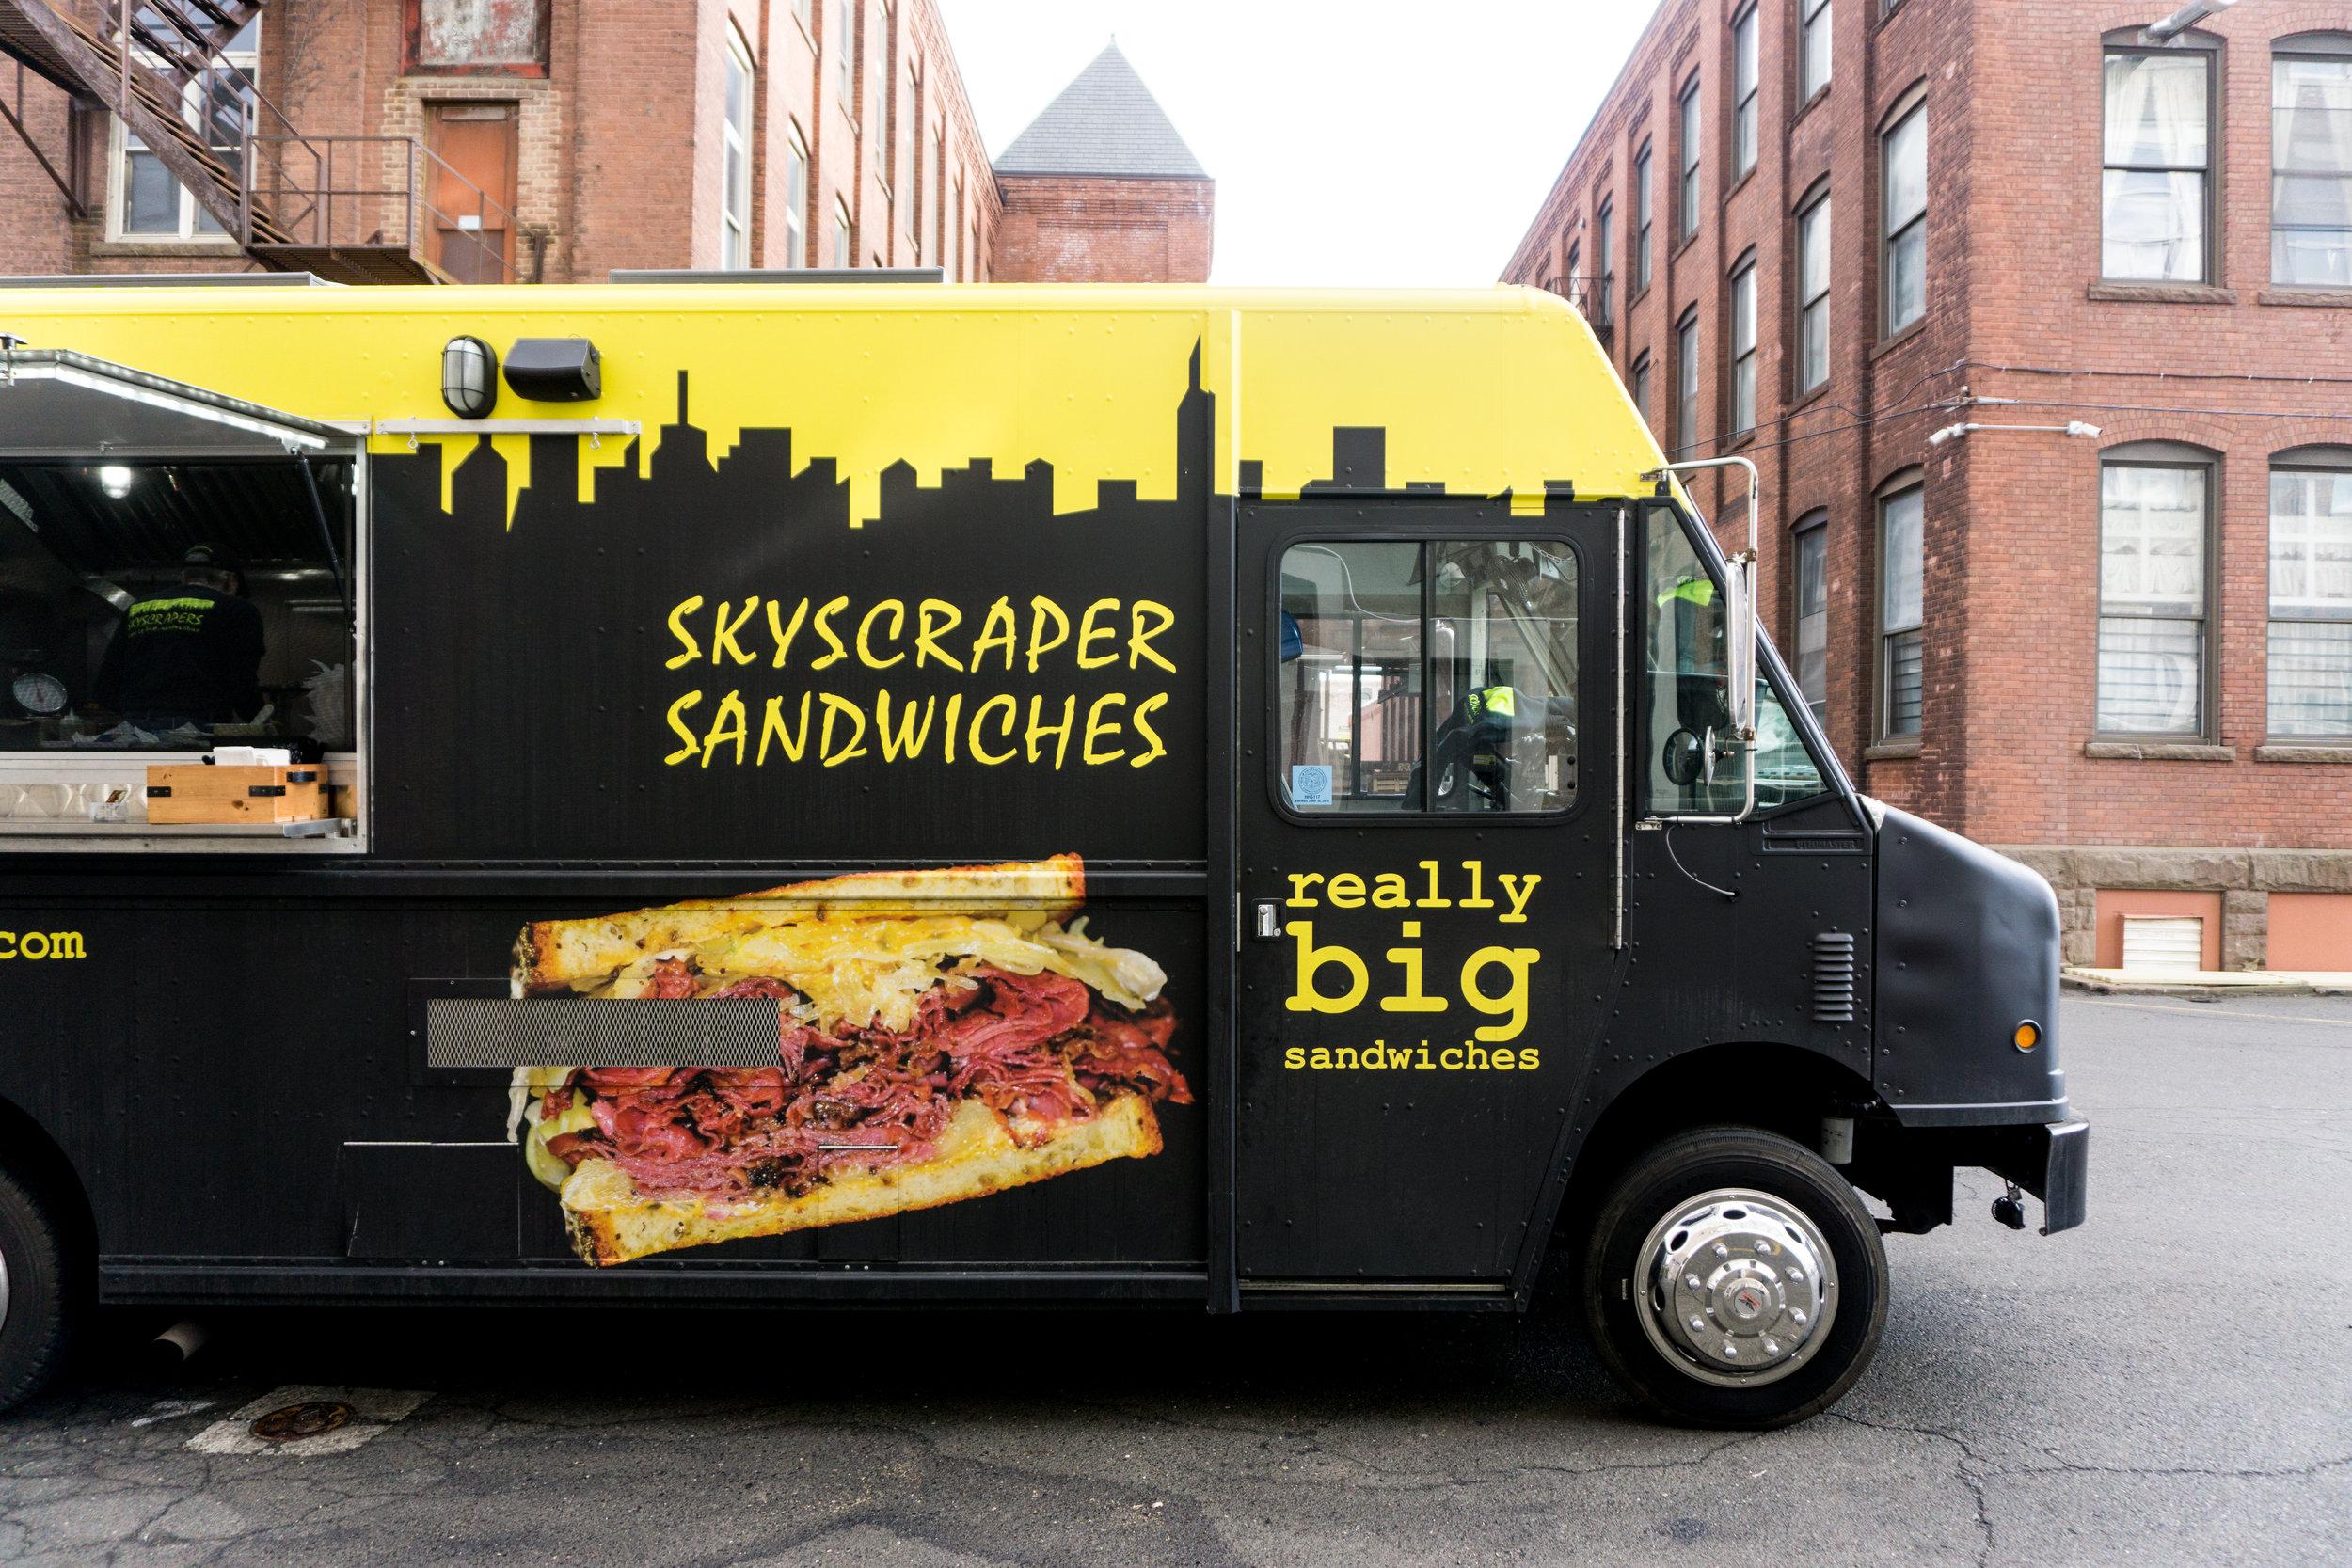 Skyscraper Sandwich Truck at Know Good Market